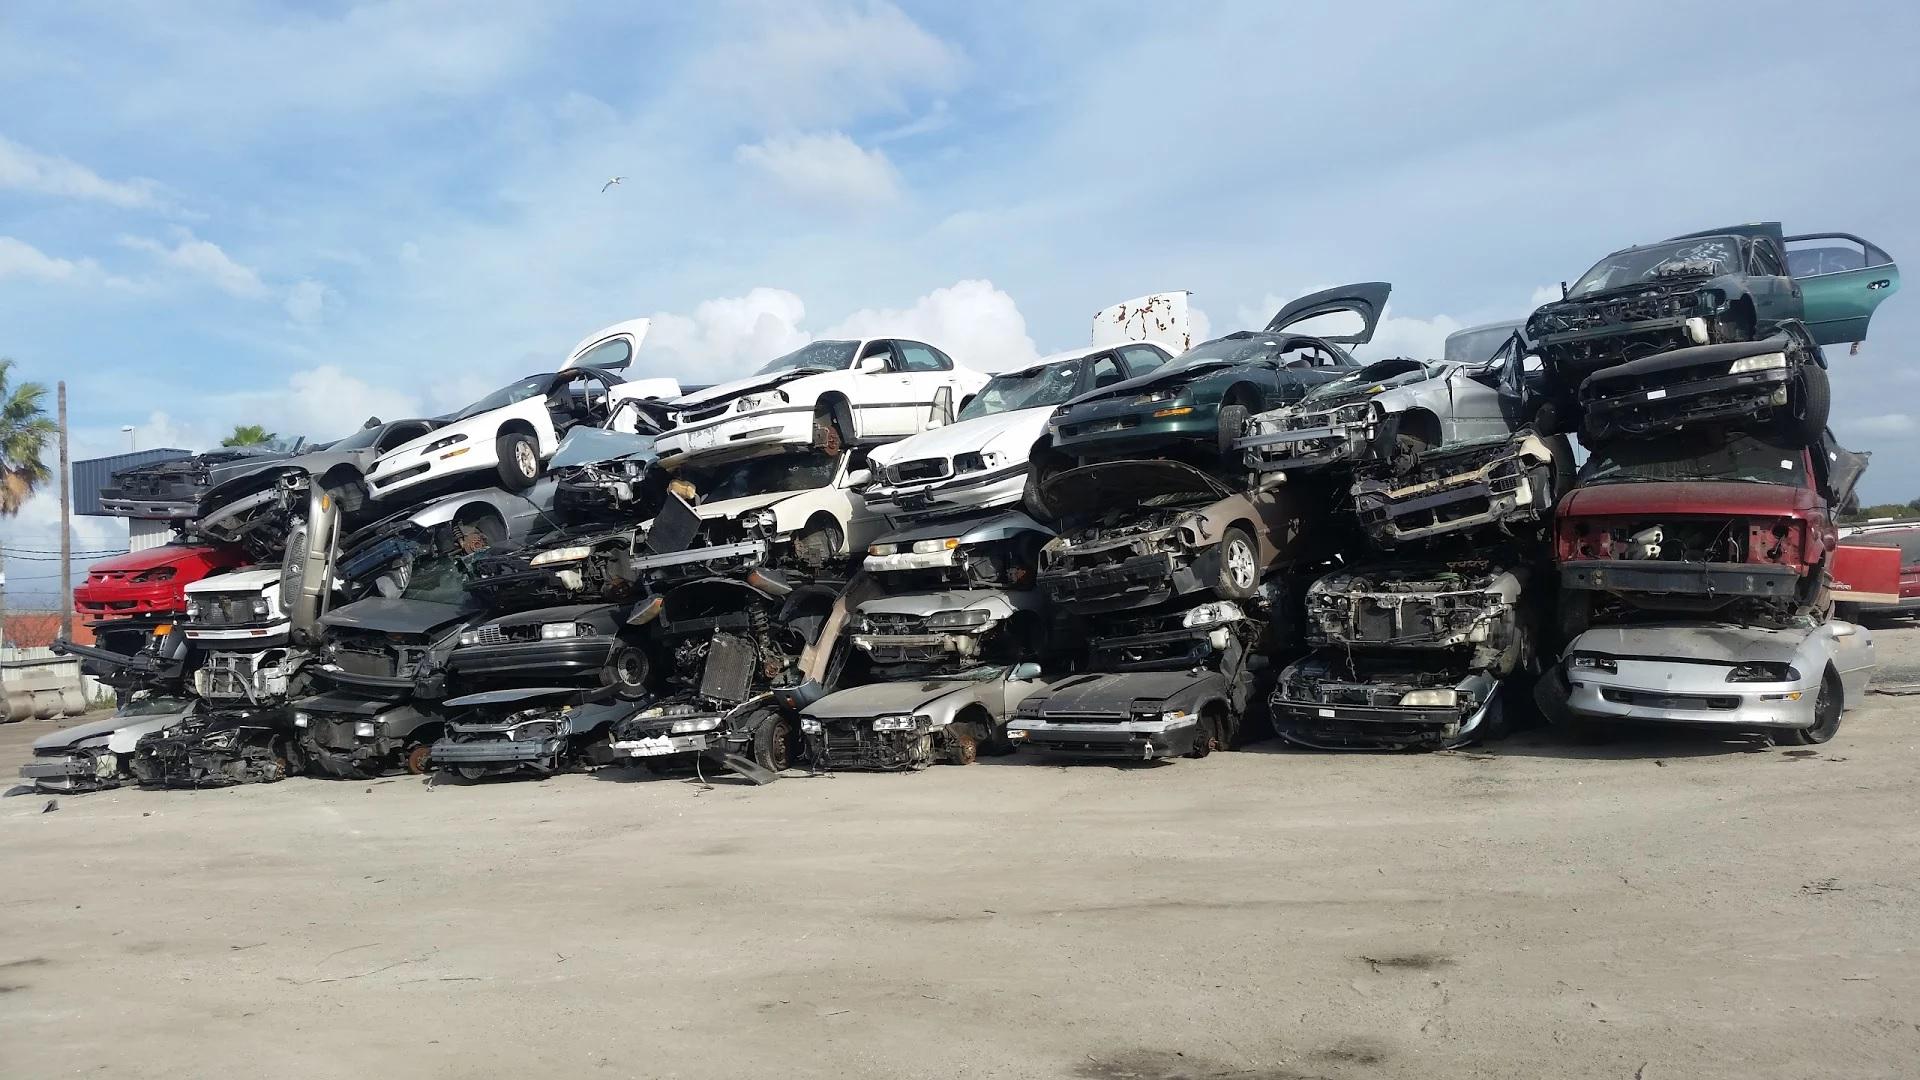 Junk car PHD, Piled Higher and Deeper